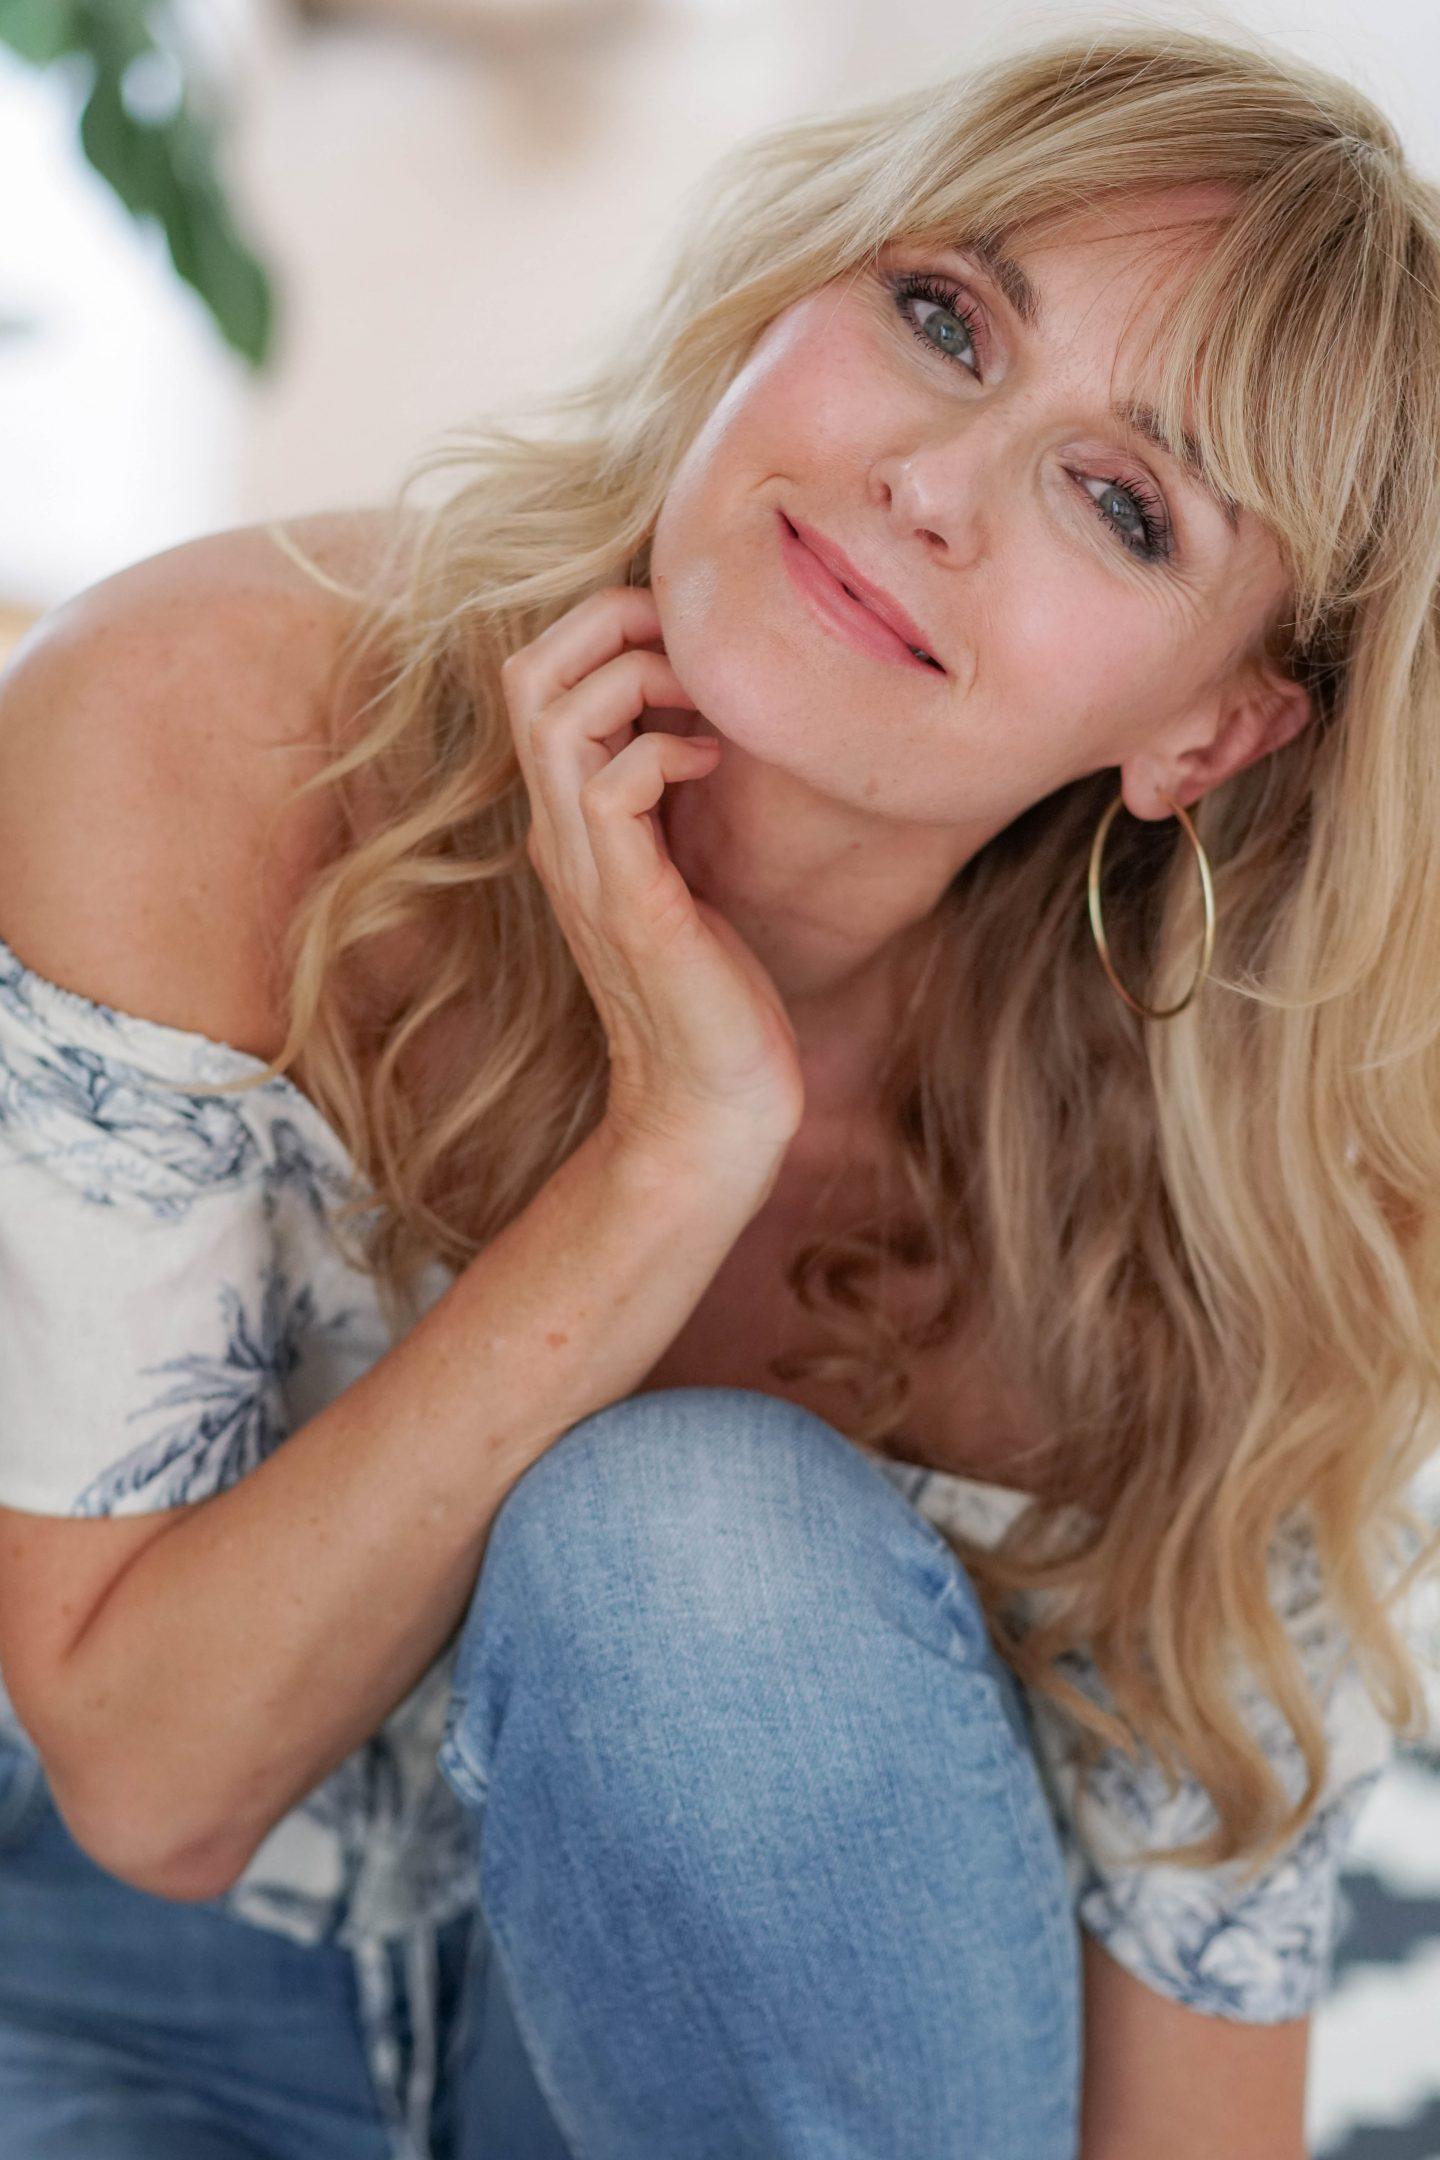 Nowshine Beauty Blog, Beauty Blog über 40, Anti Aging Beauty, Beauty Blog ü 30, Beauty Bloggerin, Influencer ü30 ü40, Pigmentflecken, Anti Aging, Falten,